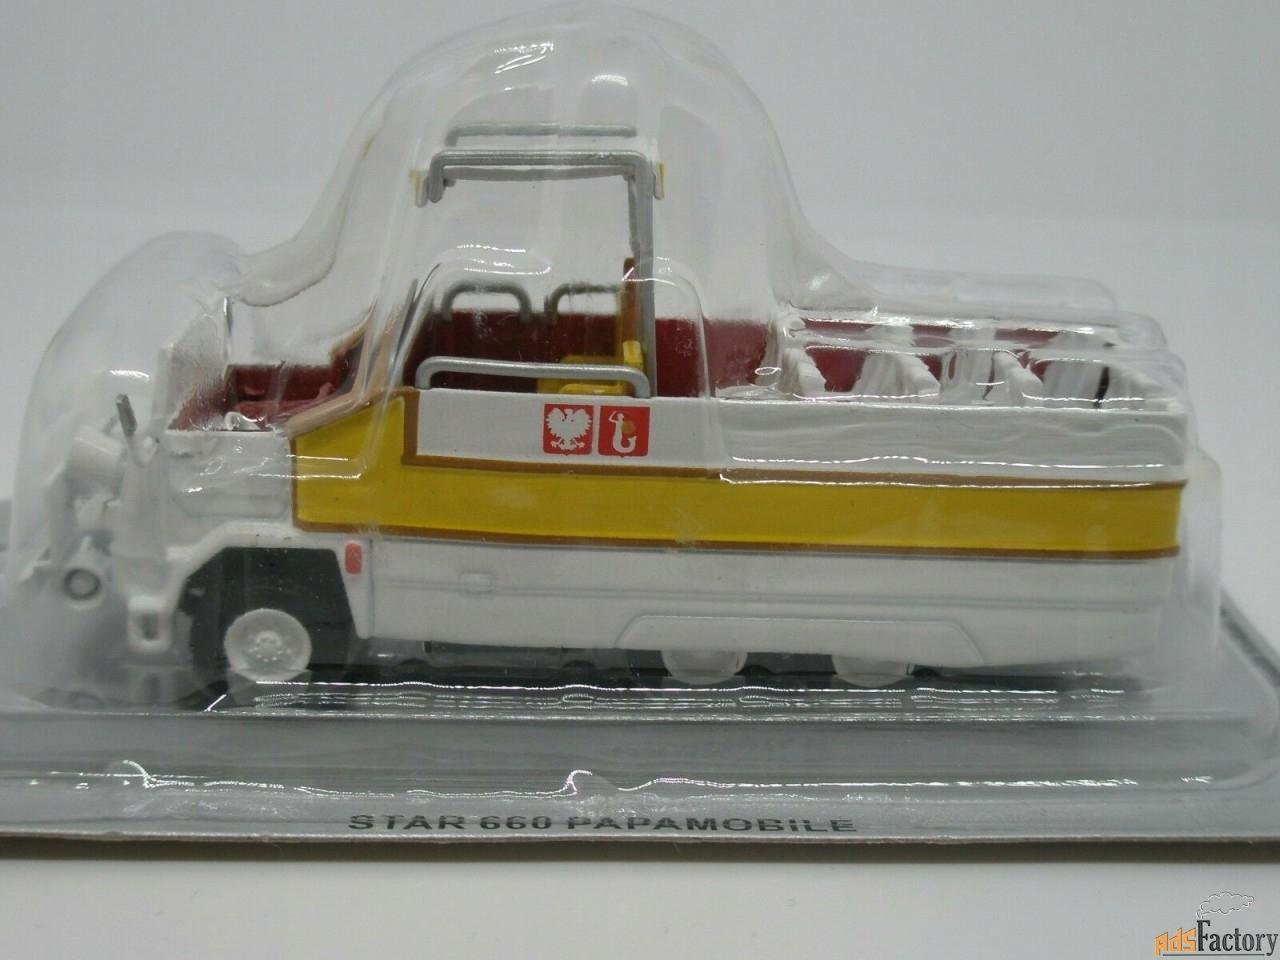 Star 660 Papamobile Папамобиль 1979